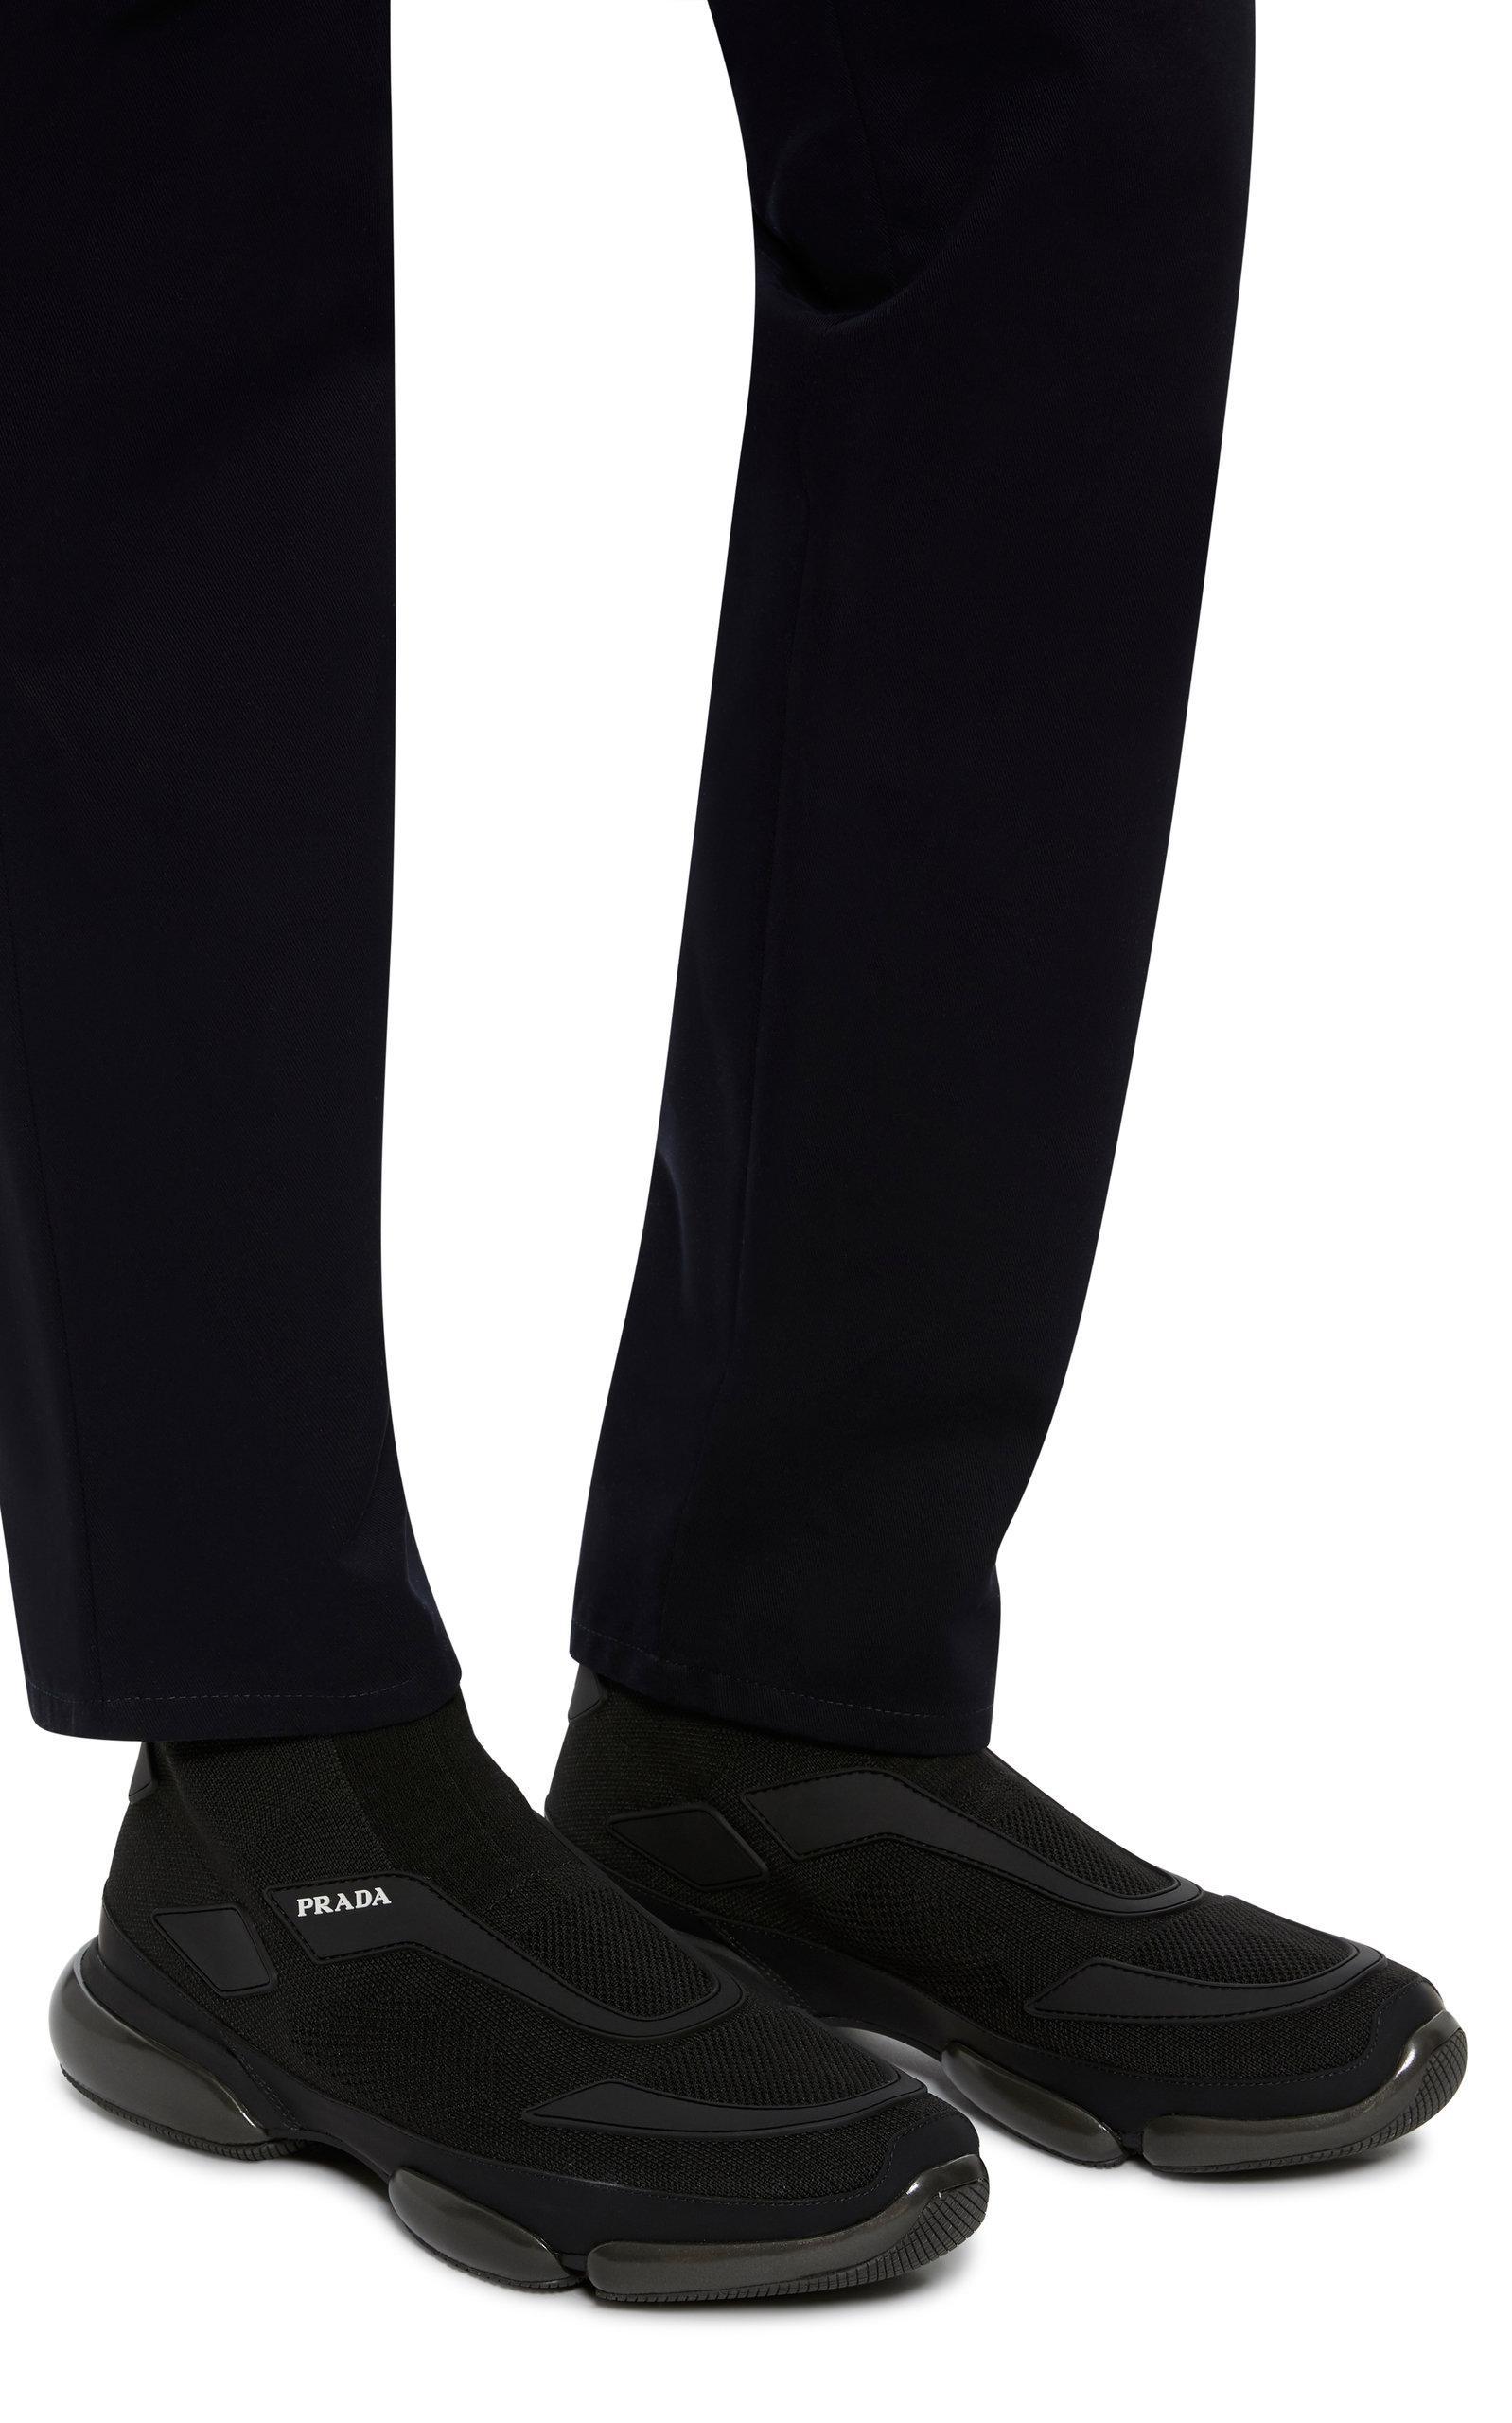 246ff7013fe2 Prada - Black Cloudbust Stretch-knit High-top Sneakers for Men - Lyst. View  fullscreen